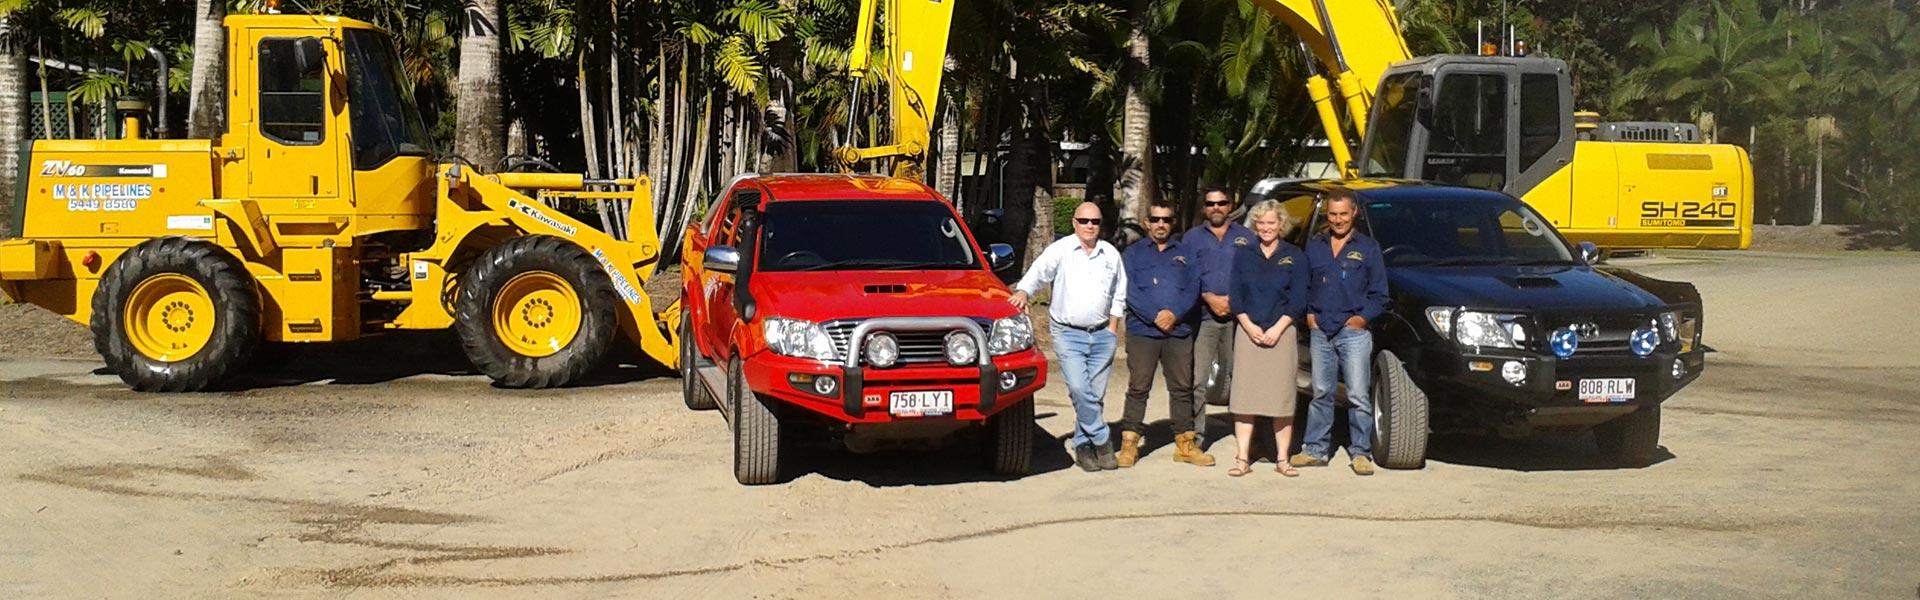 m and k pipelines pty ltd excavator vehicle fleet and our crew